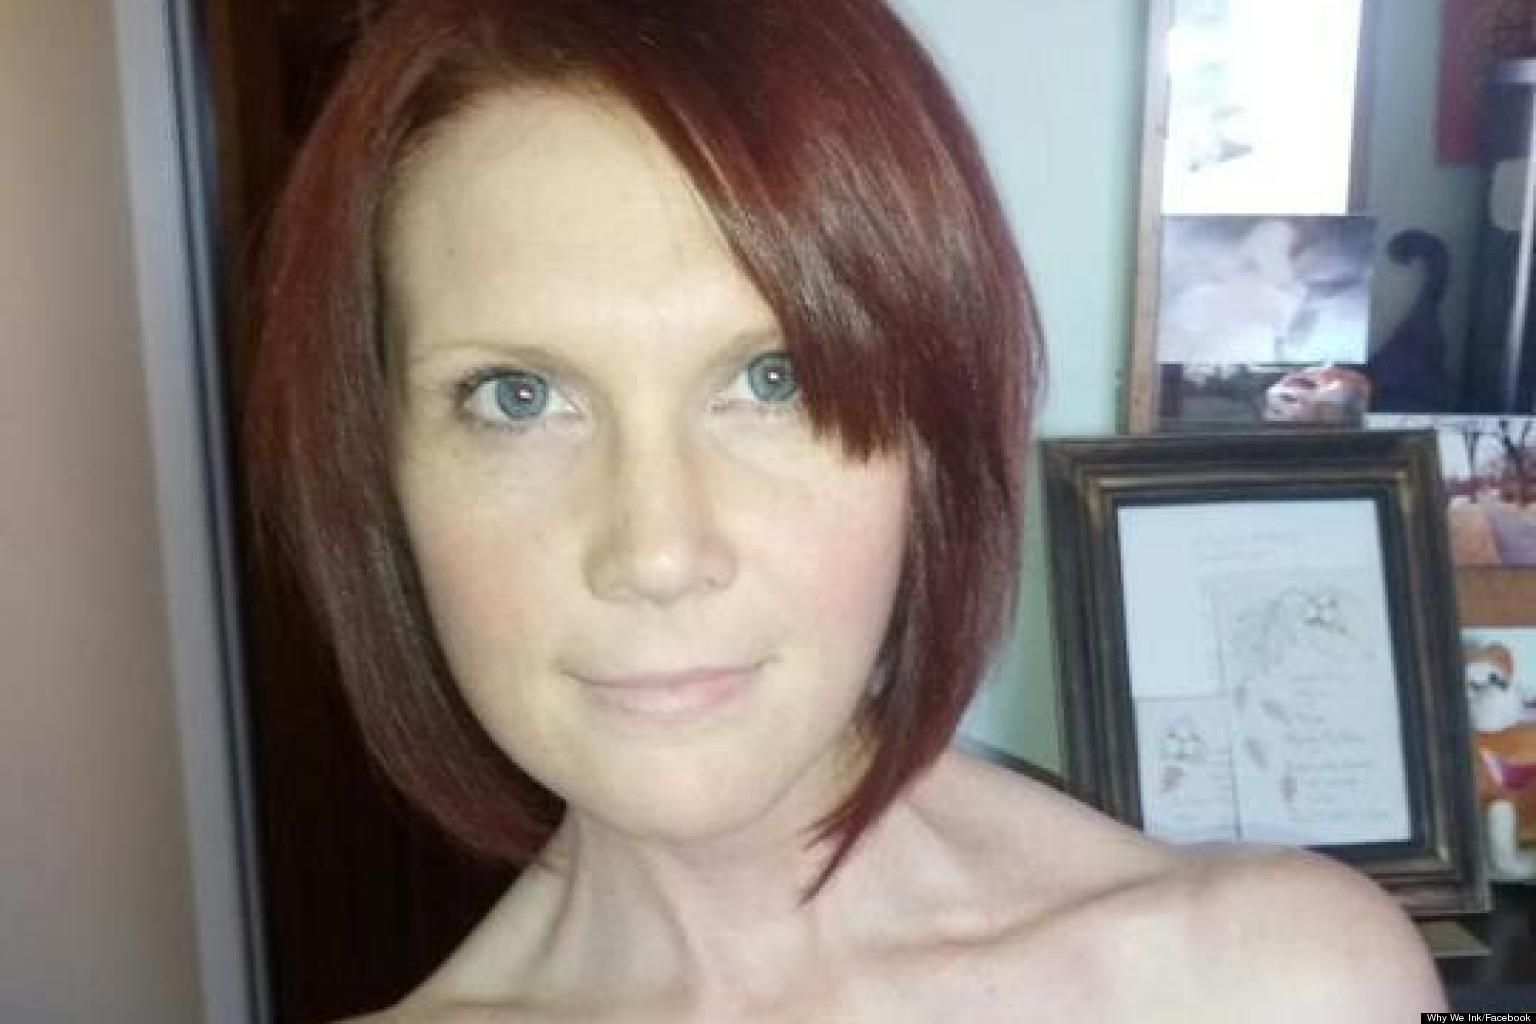 Joanne Kelly Tattoo O-kelly-davidson-topless-photo ...